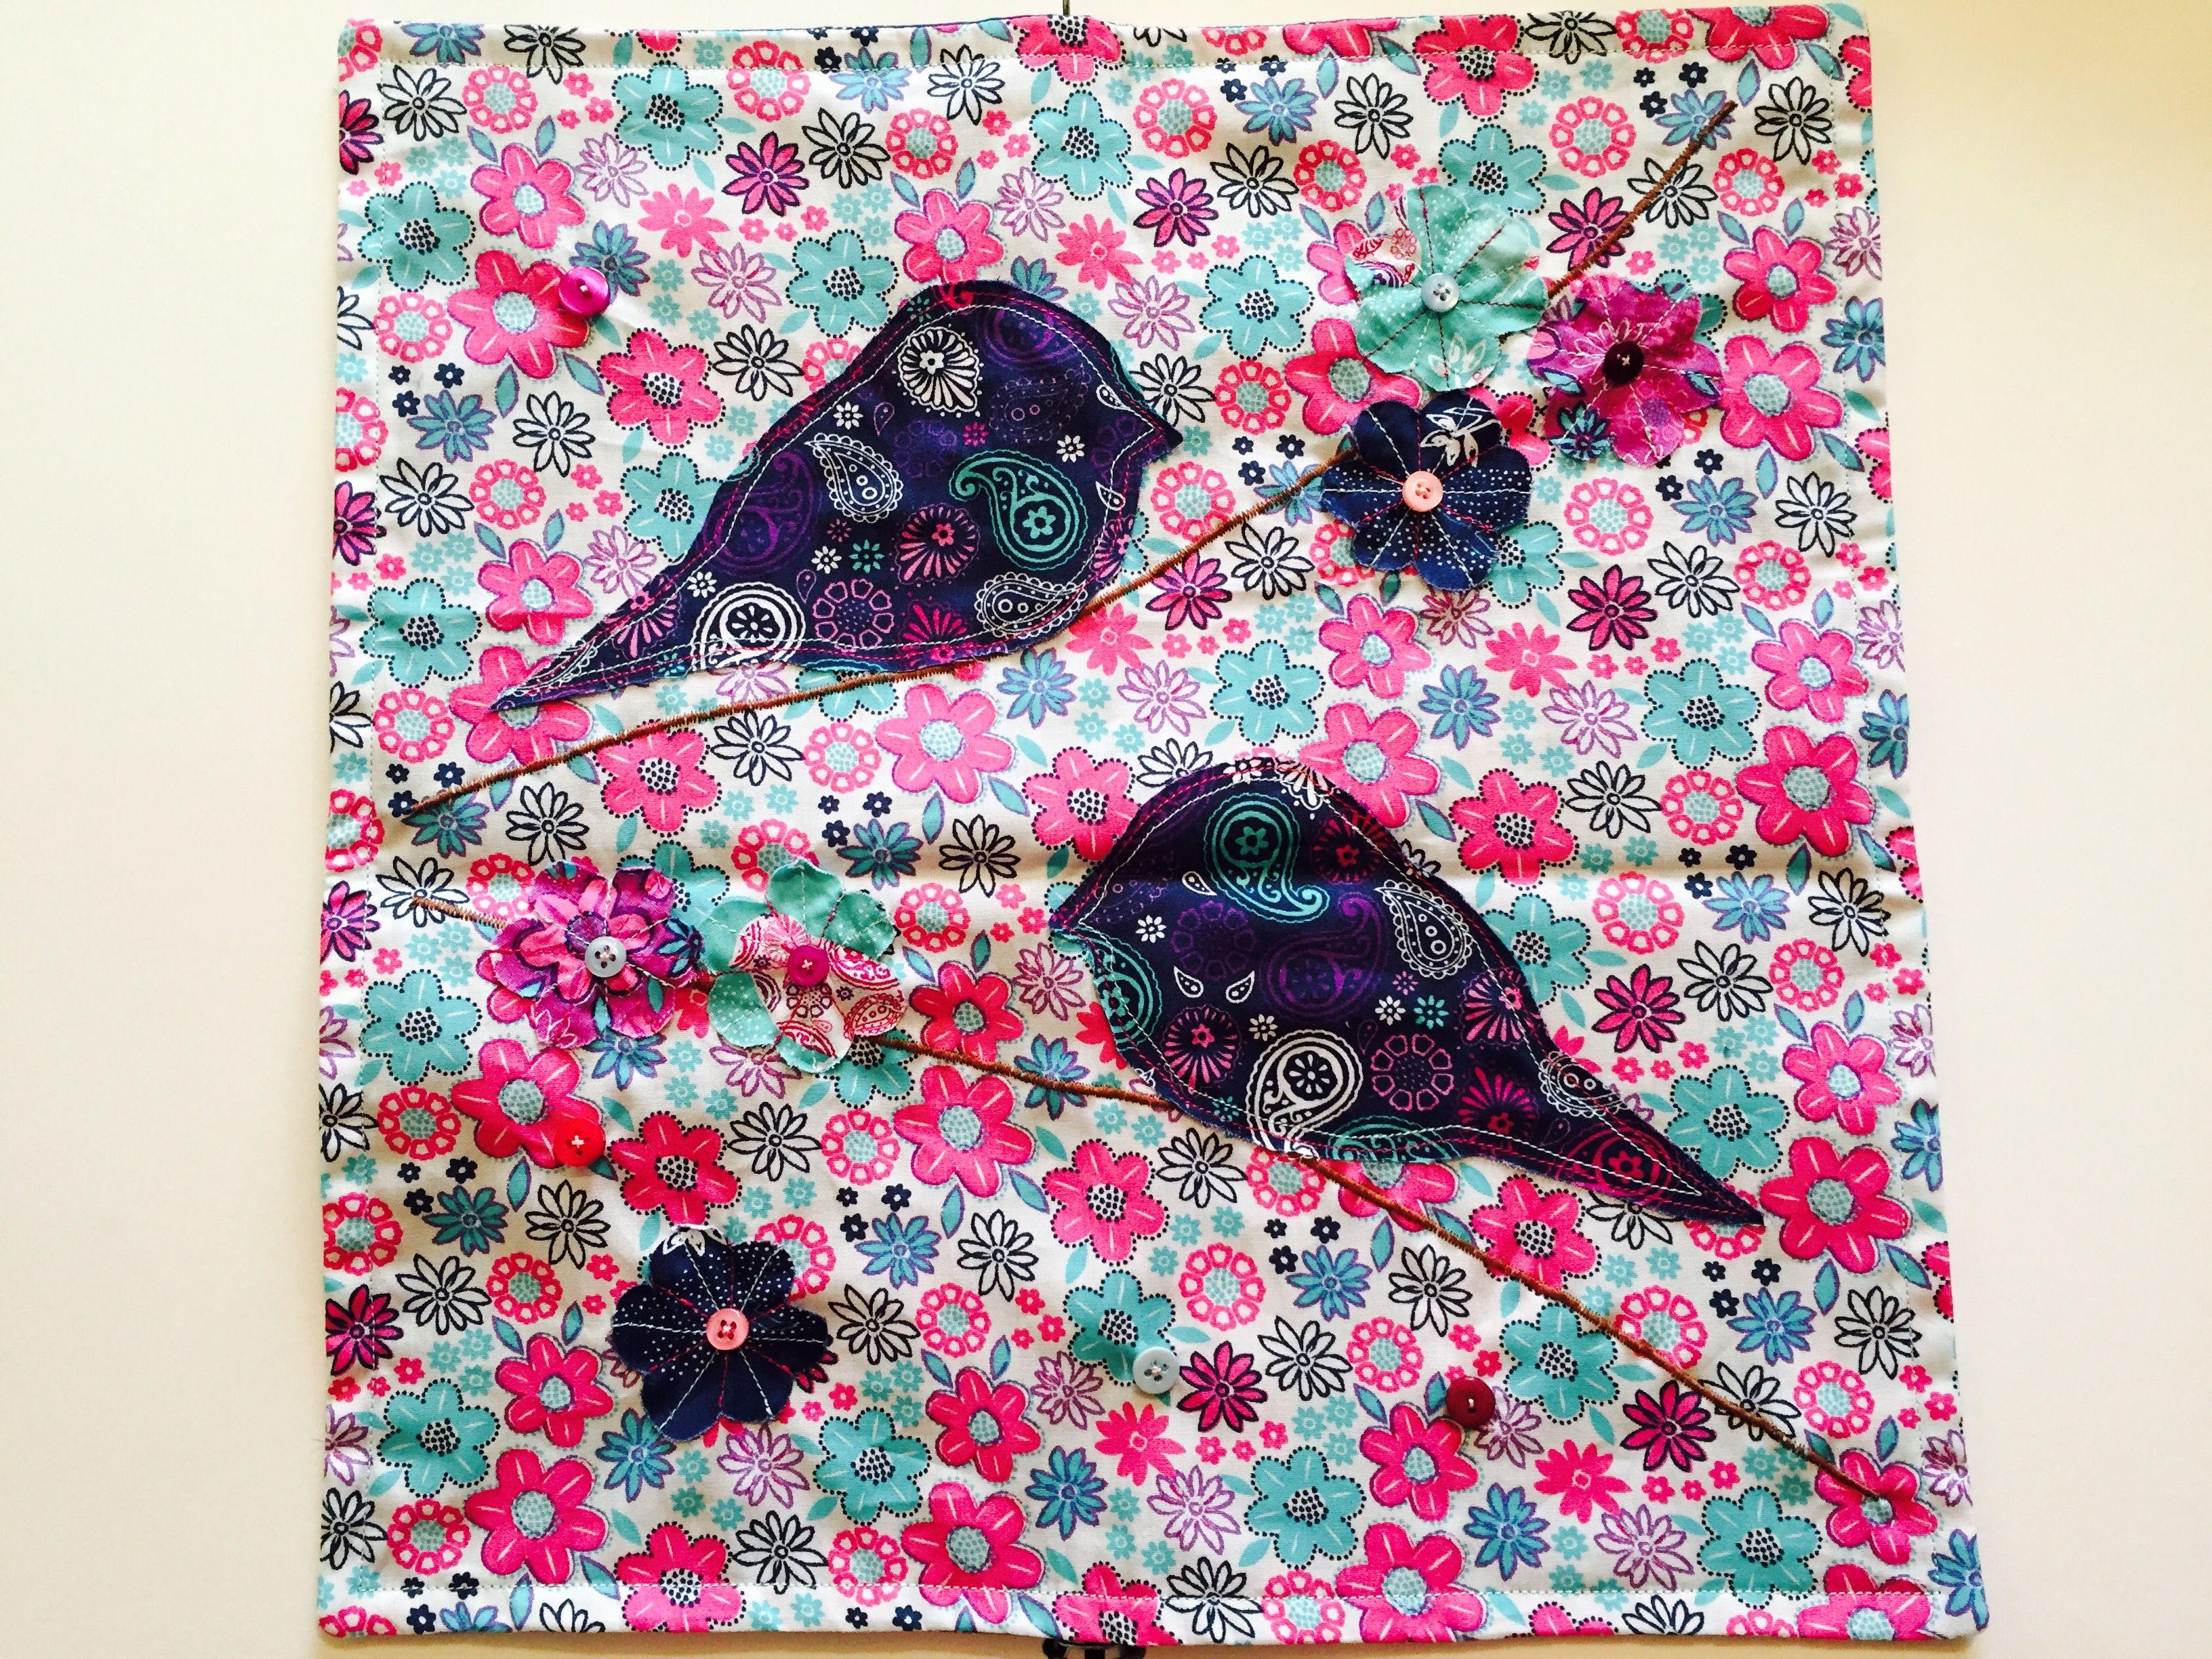 Appliqué bird cushion using The Craft Cotton Company Paisley bird fabrics. Free tutorial